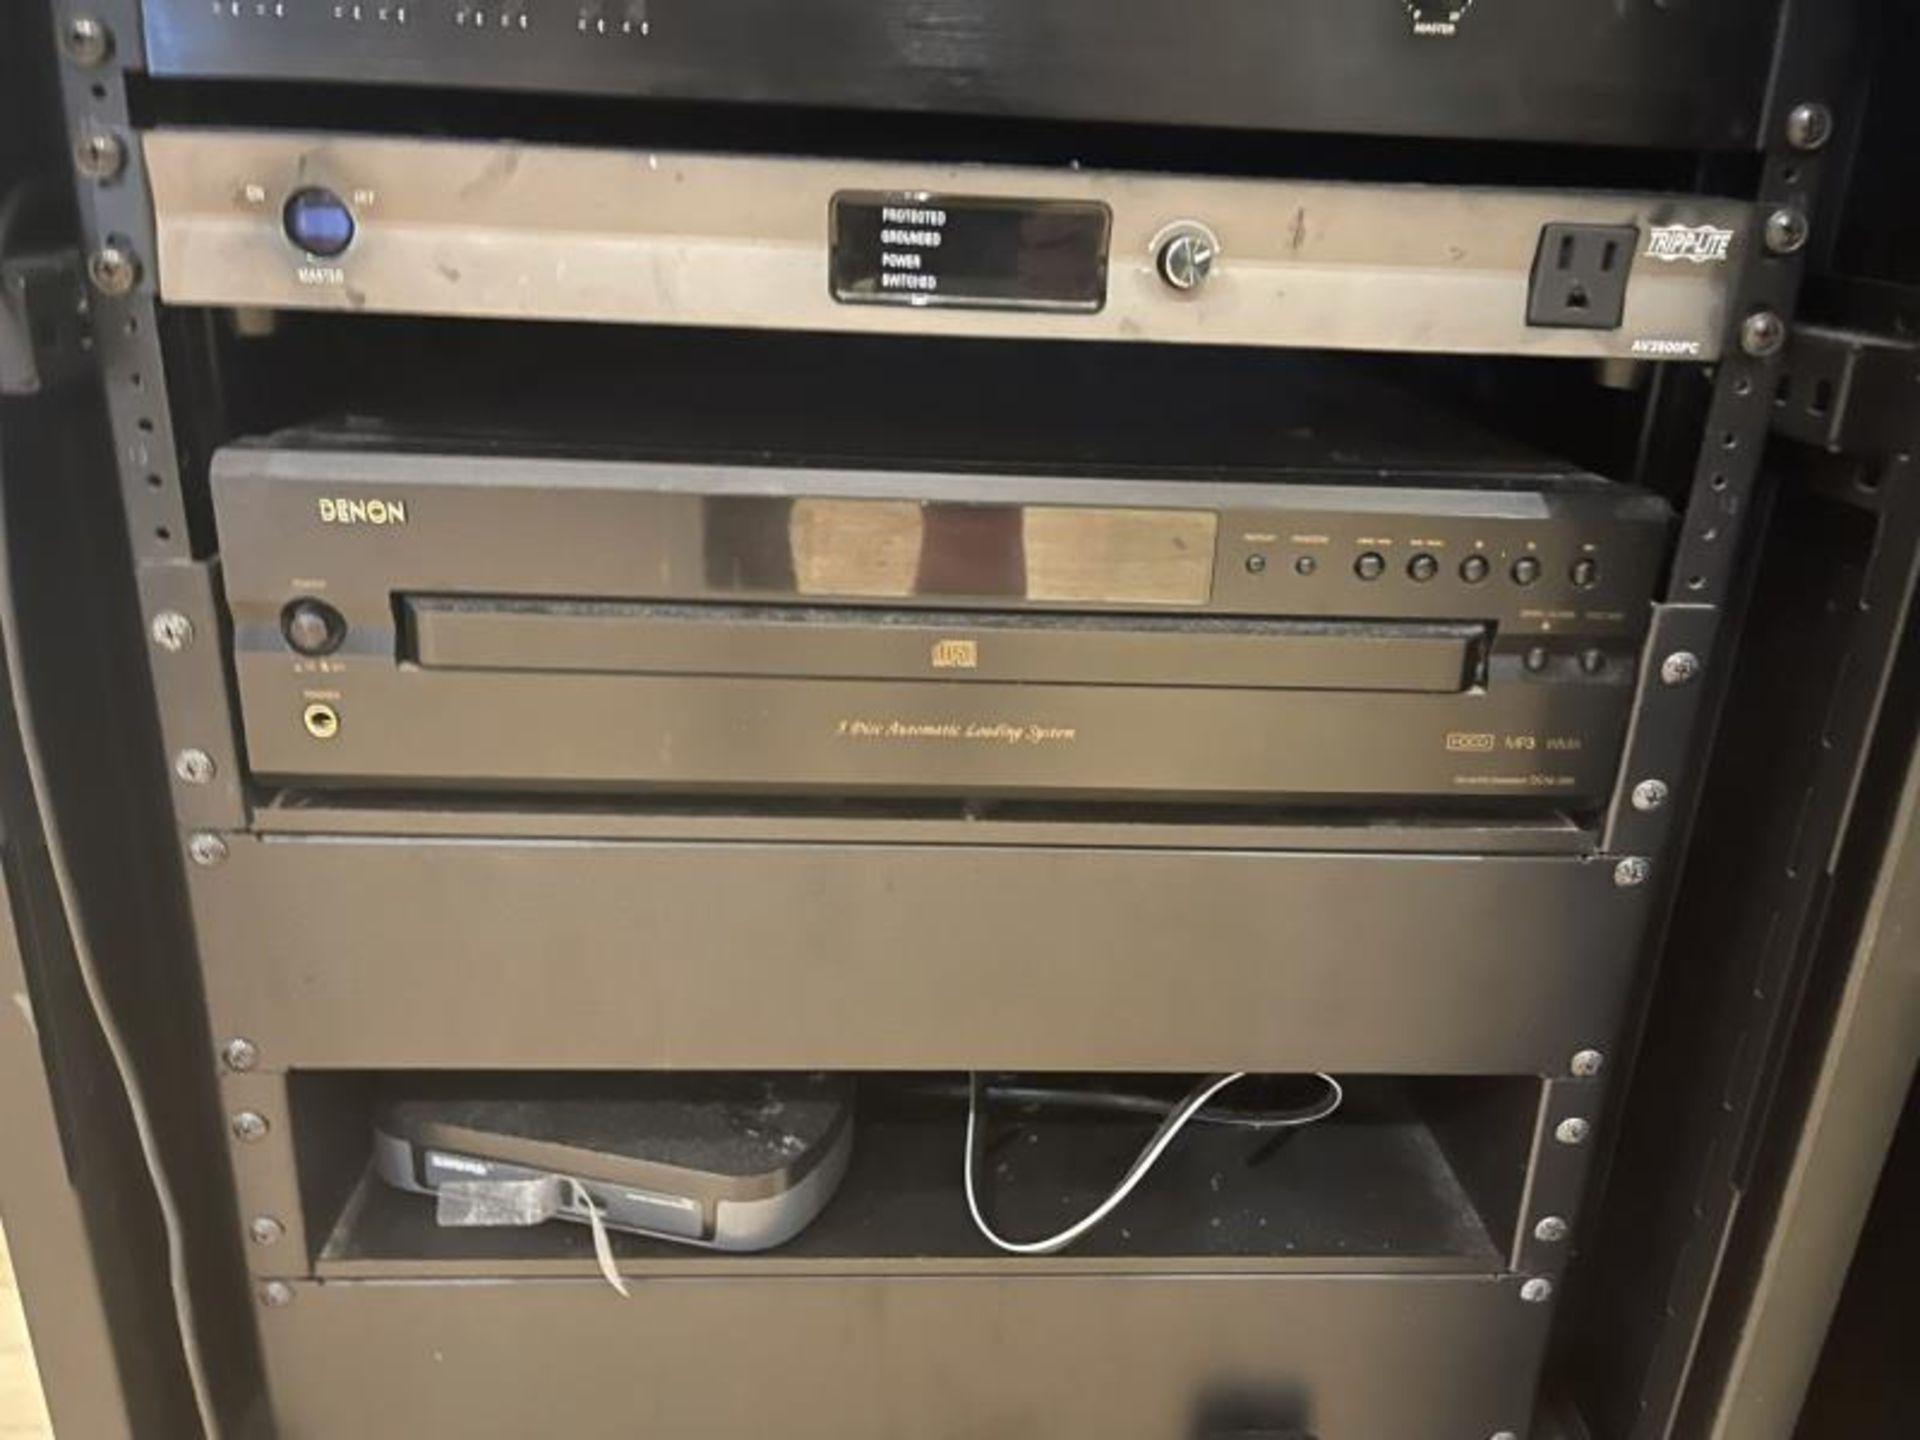 Omnimount Design Audio Cabinet with Crown 1160MA Tripplite AV3500PD, Denon 5 Disk CD Changer, Shure - Image 4 of 4